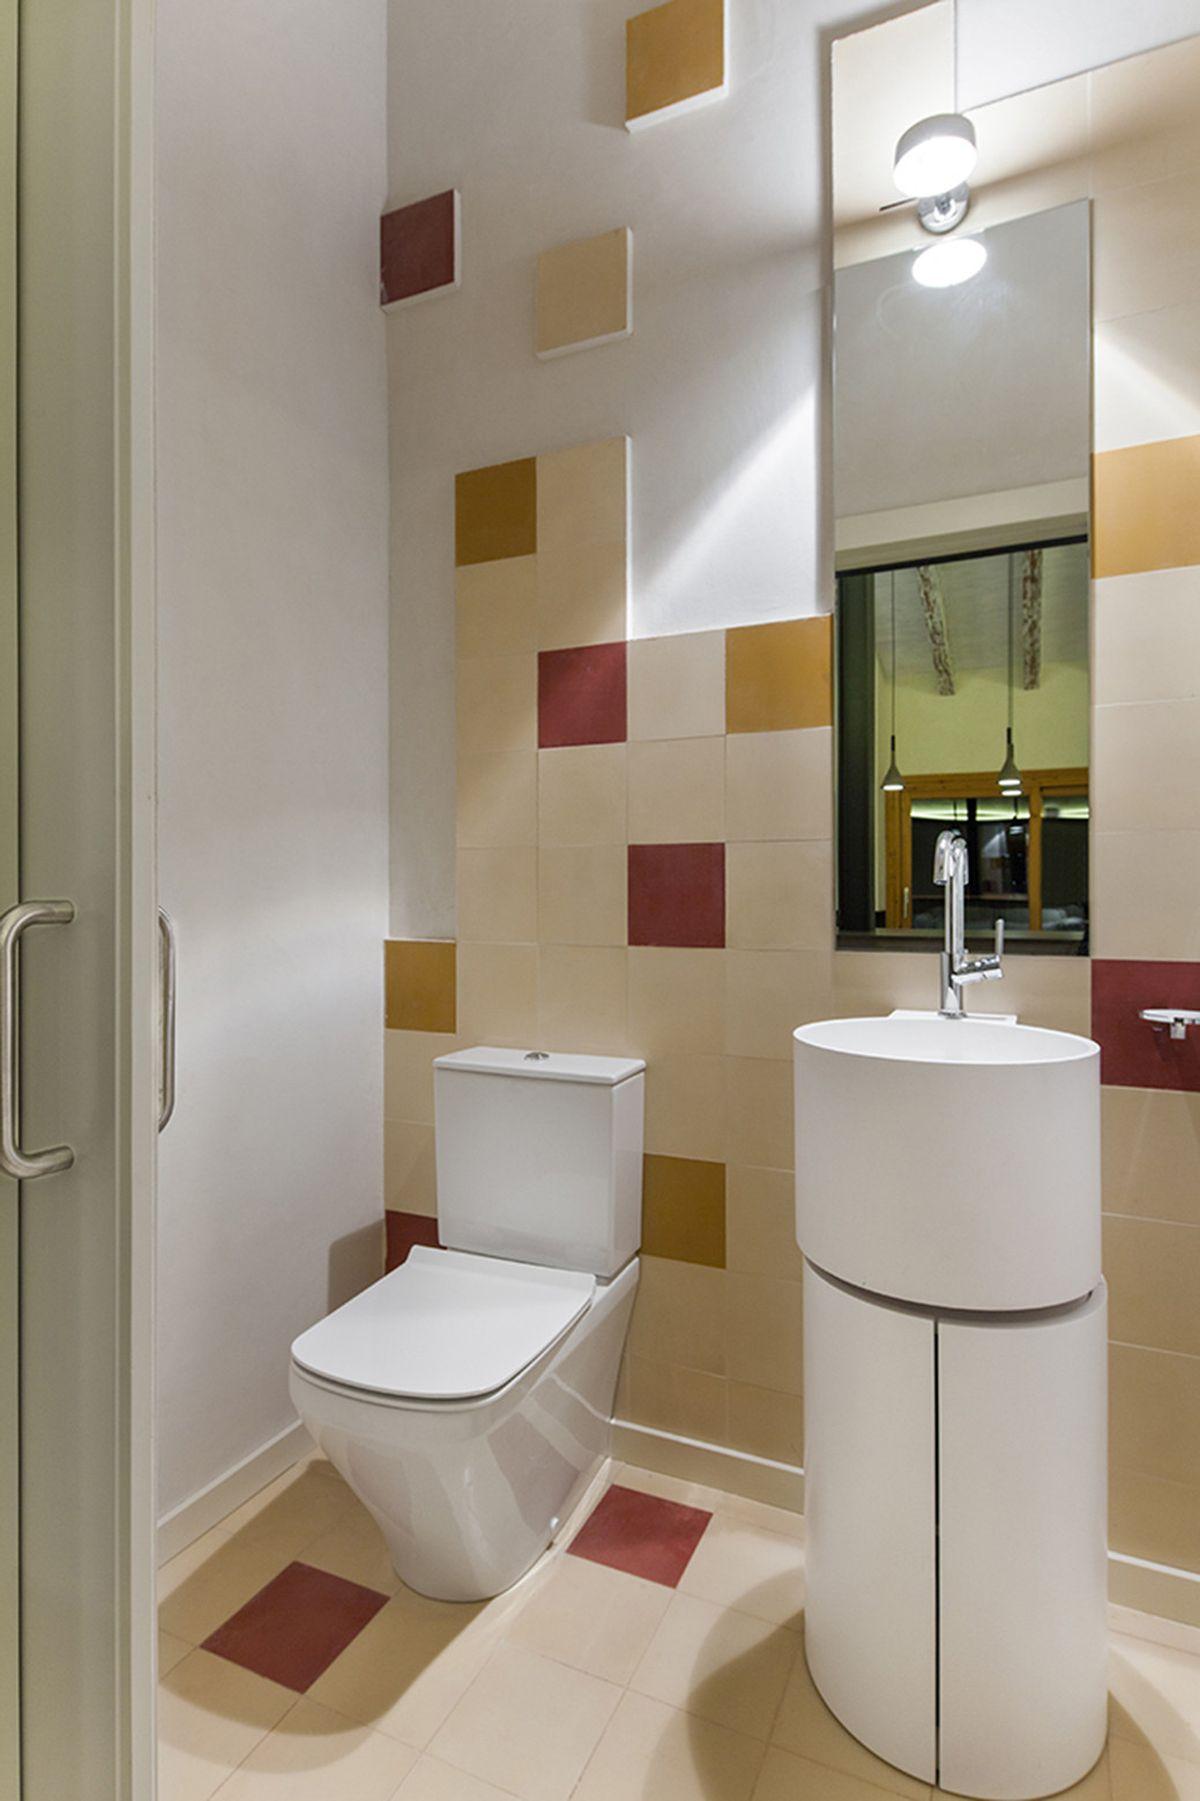 Rustic house gets rehabilitated in Spain - bathroom decor